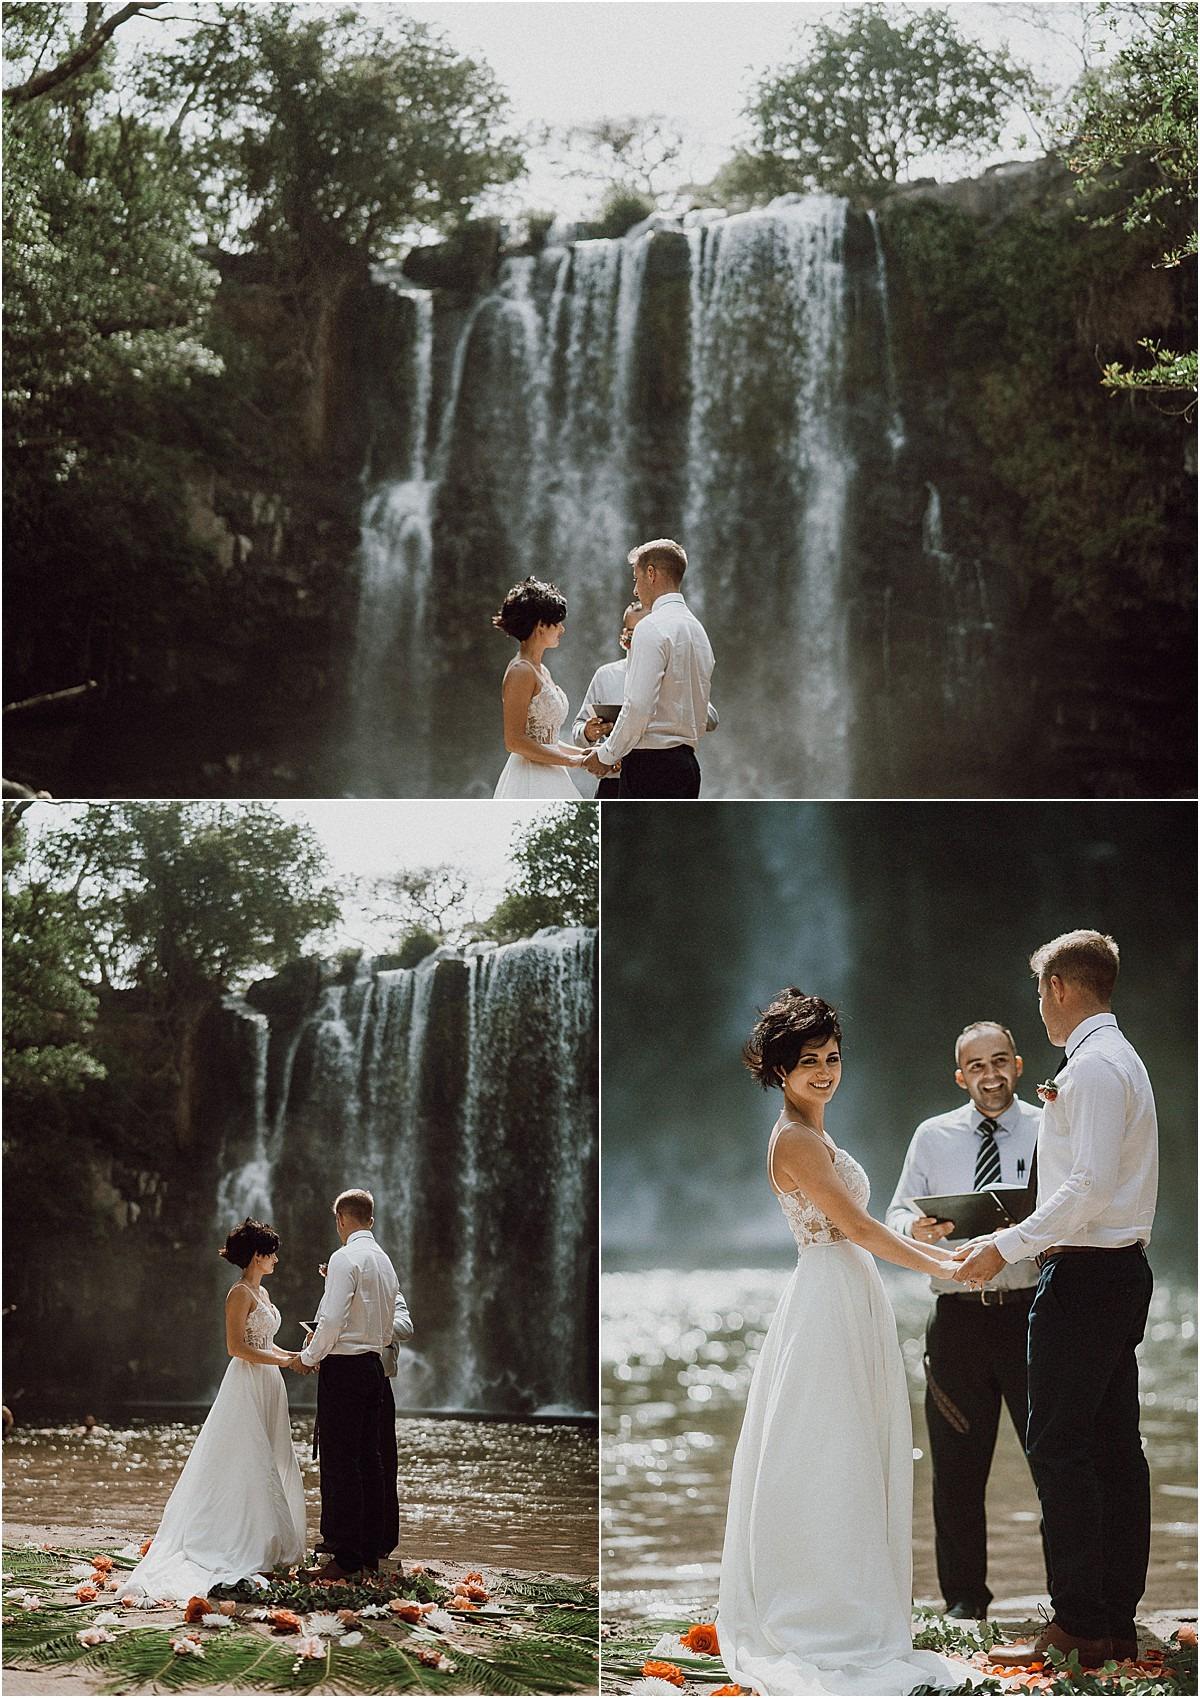 Llanos de Cortez Waterfall Elopement